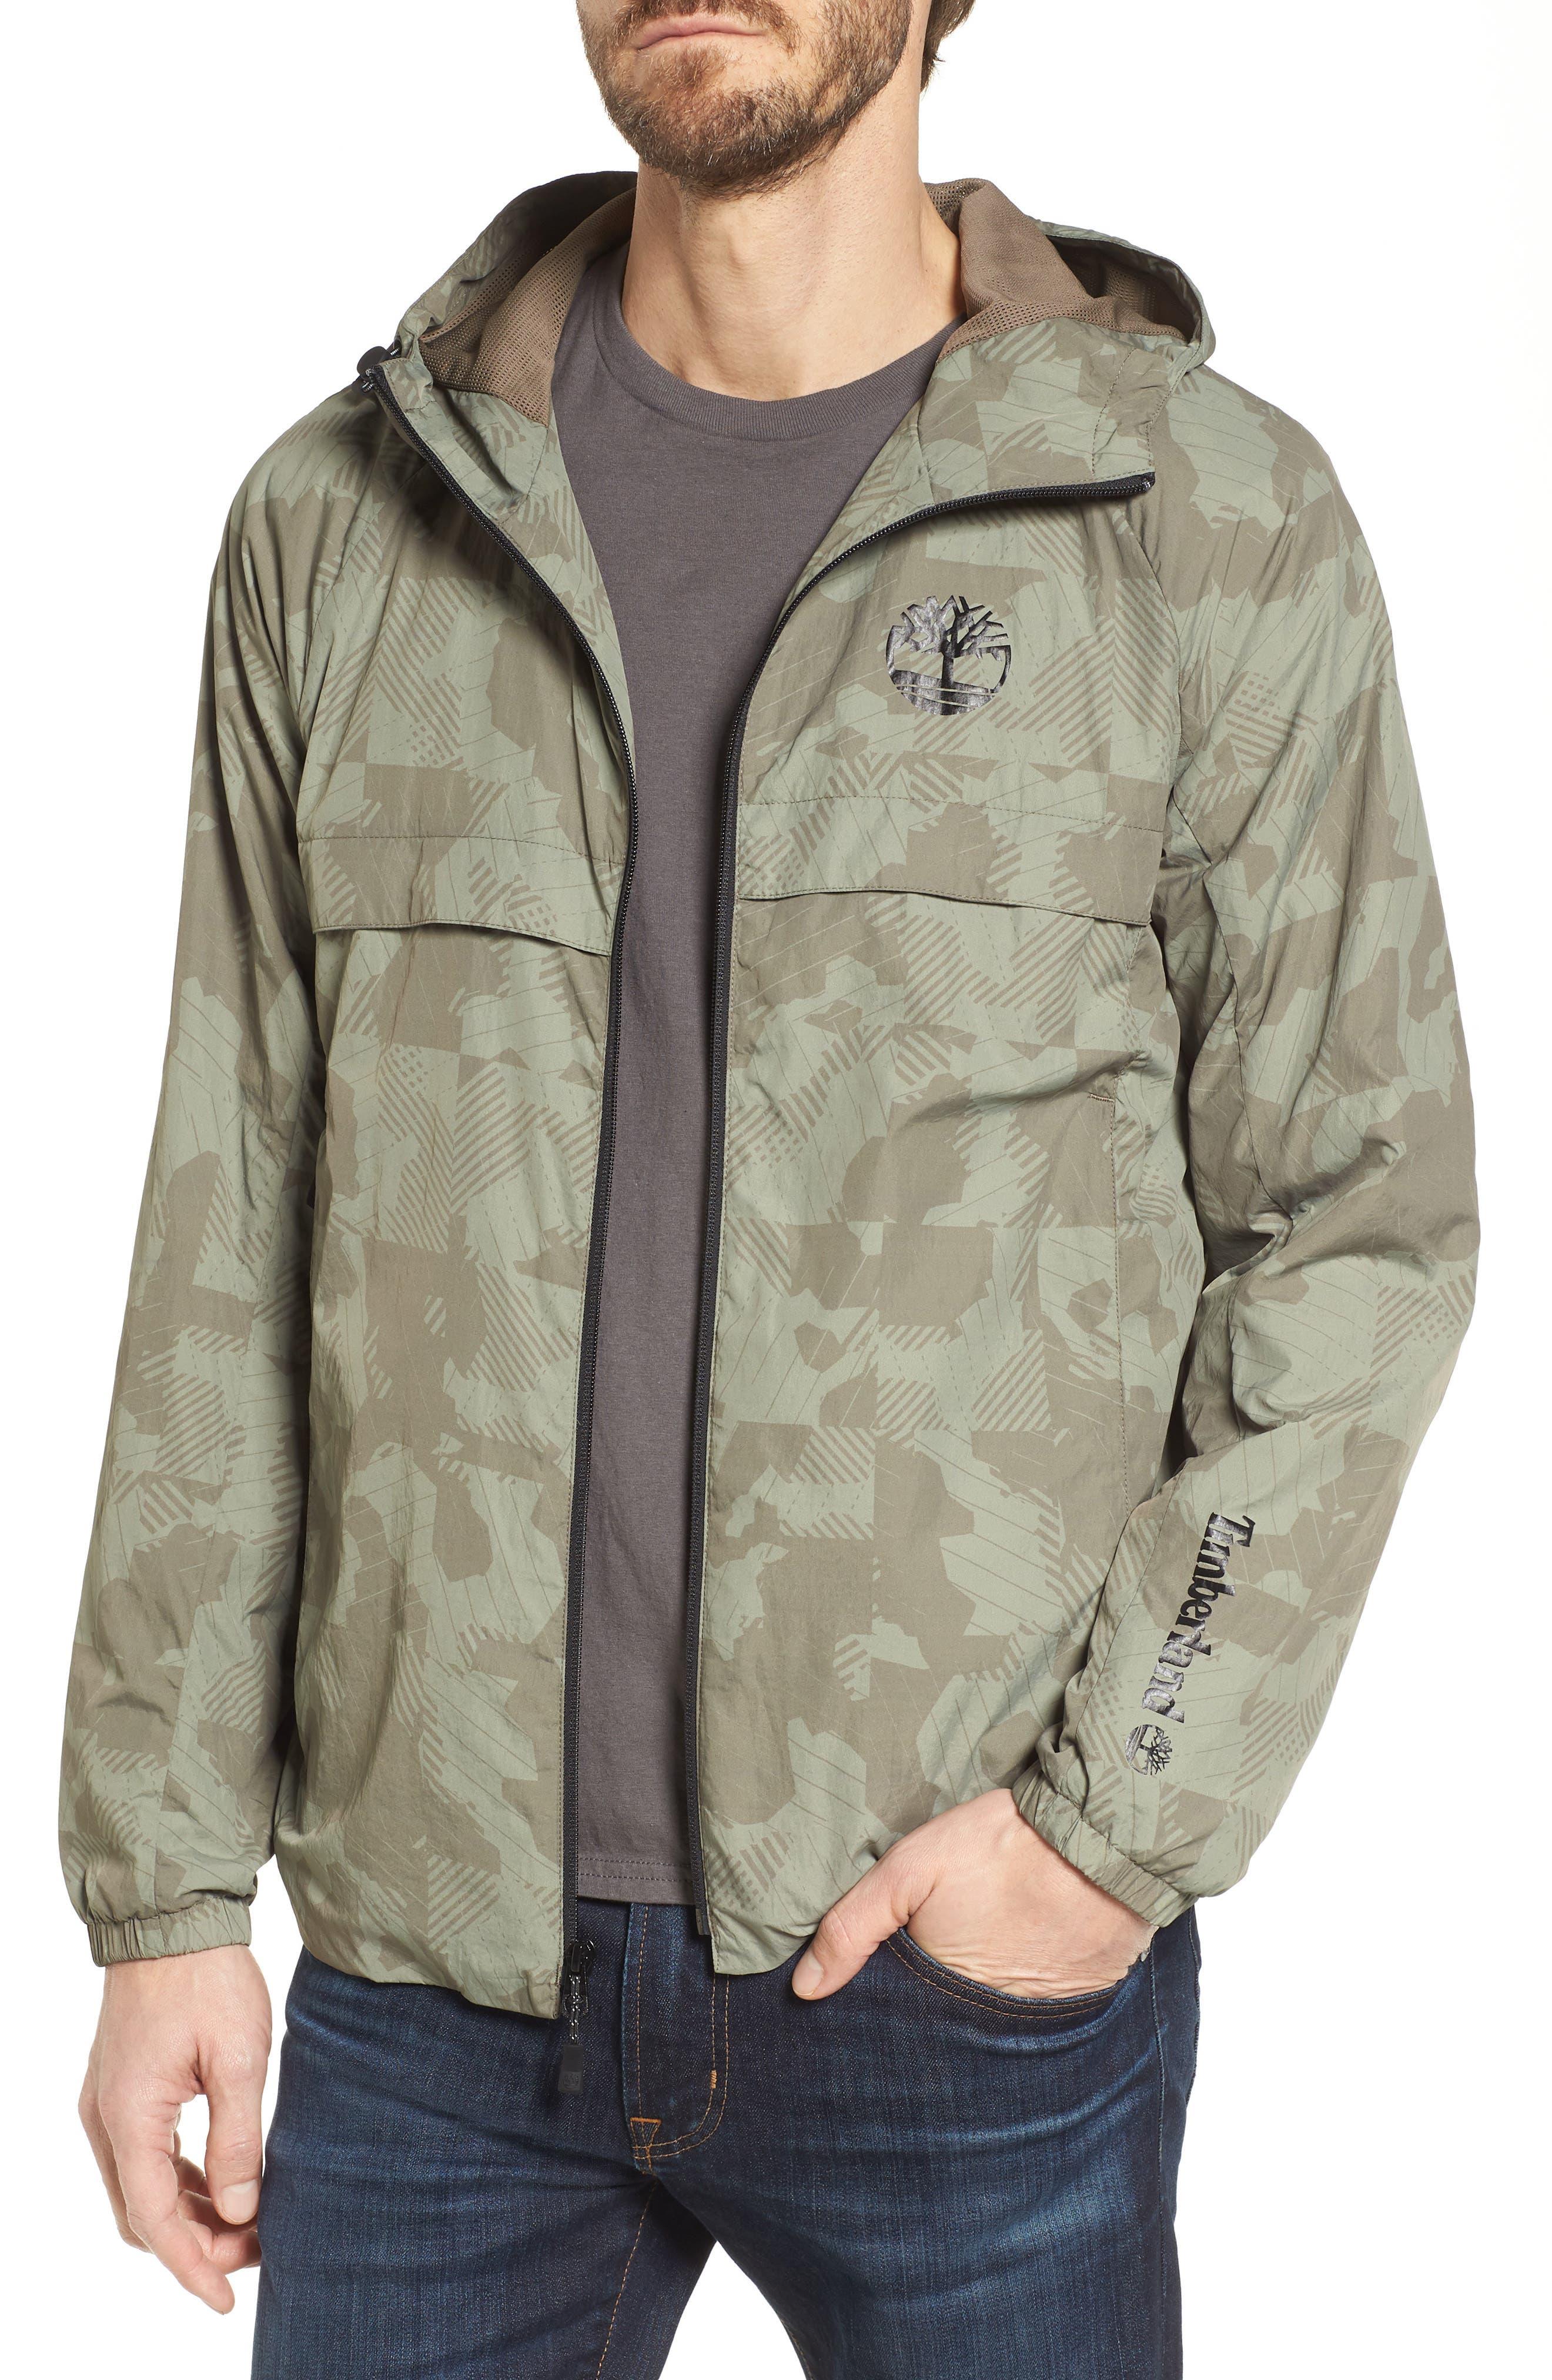 Camo Windbreaker Jacket,                             Main thumbnail 1, color,                             Bungee Cord Camo